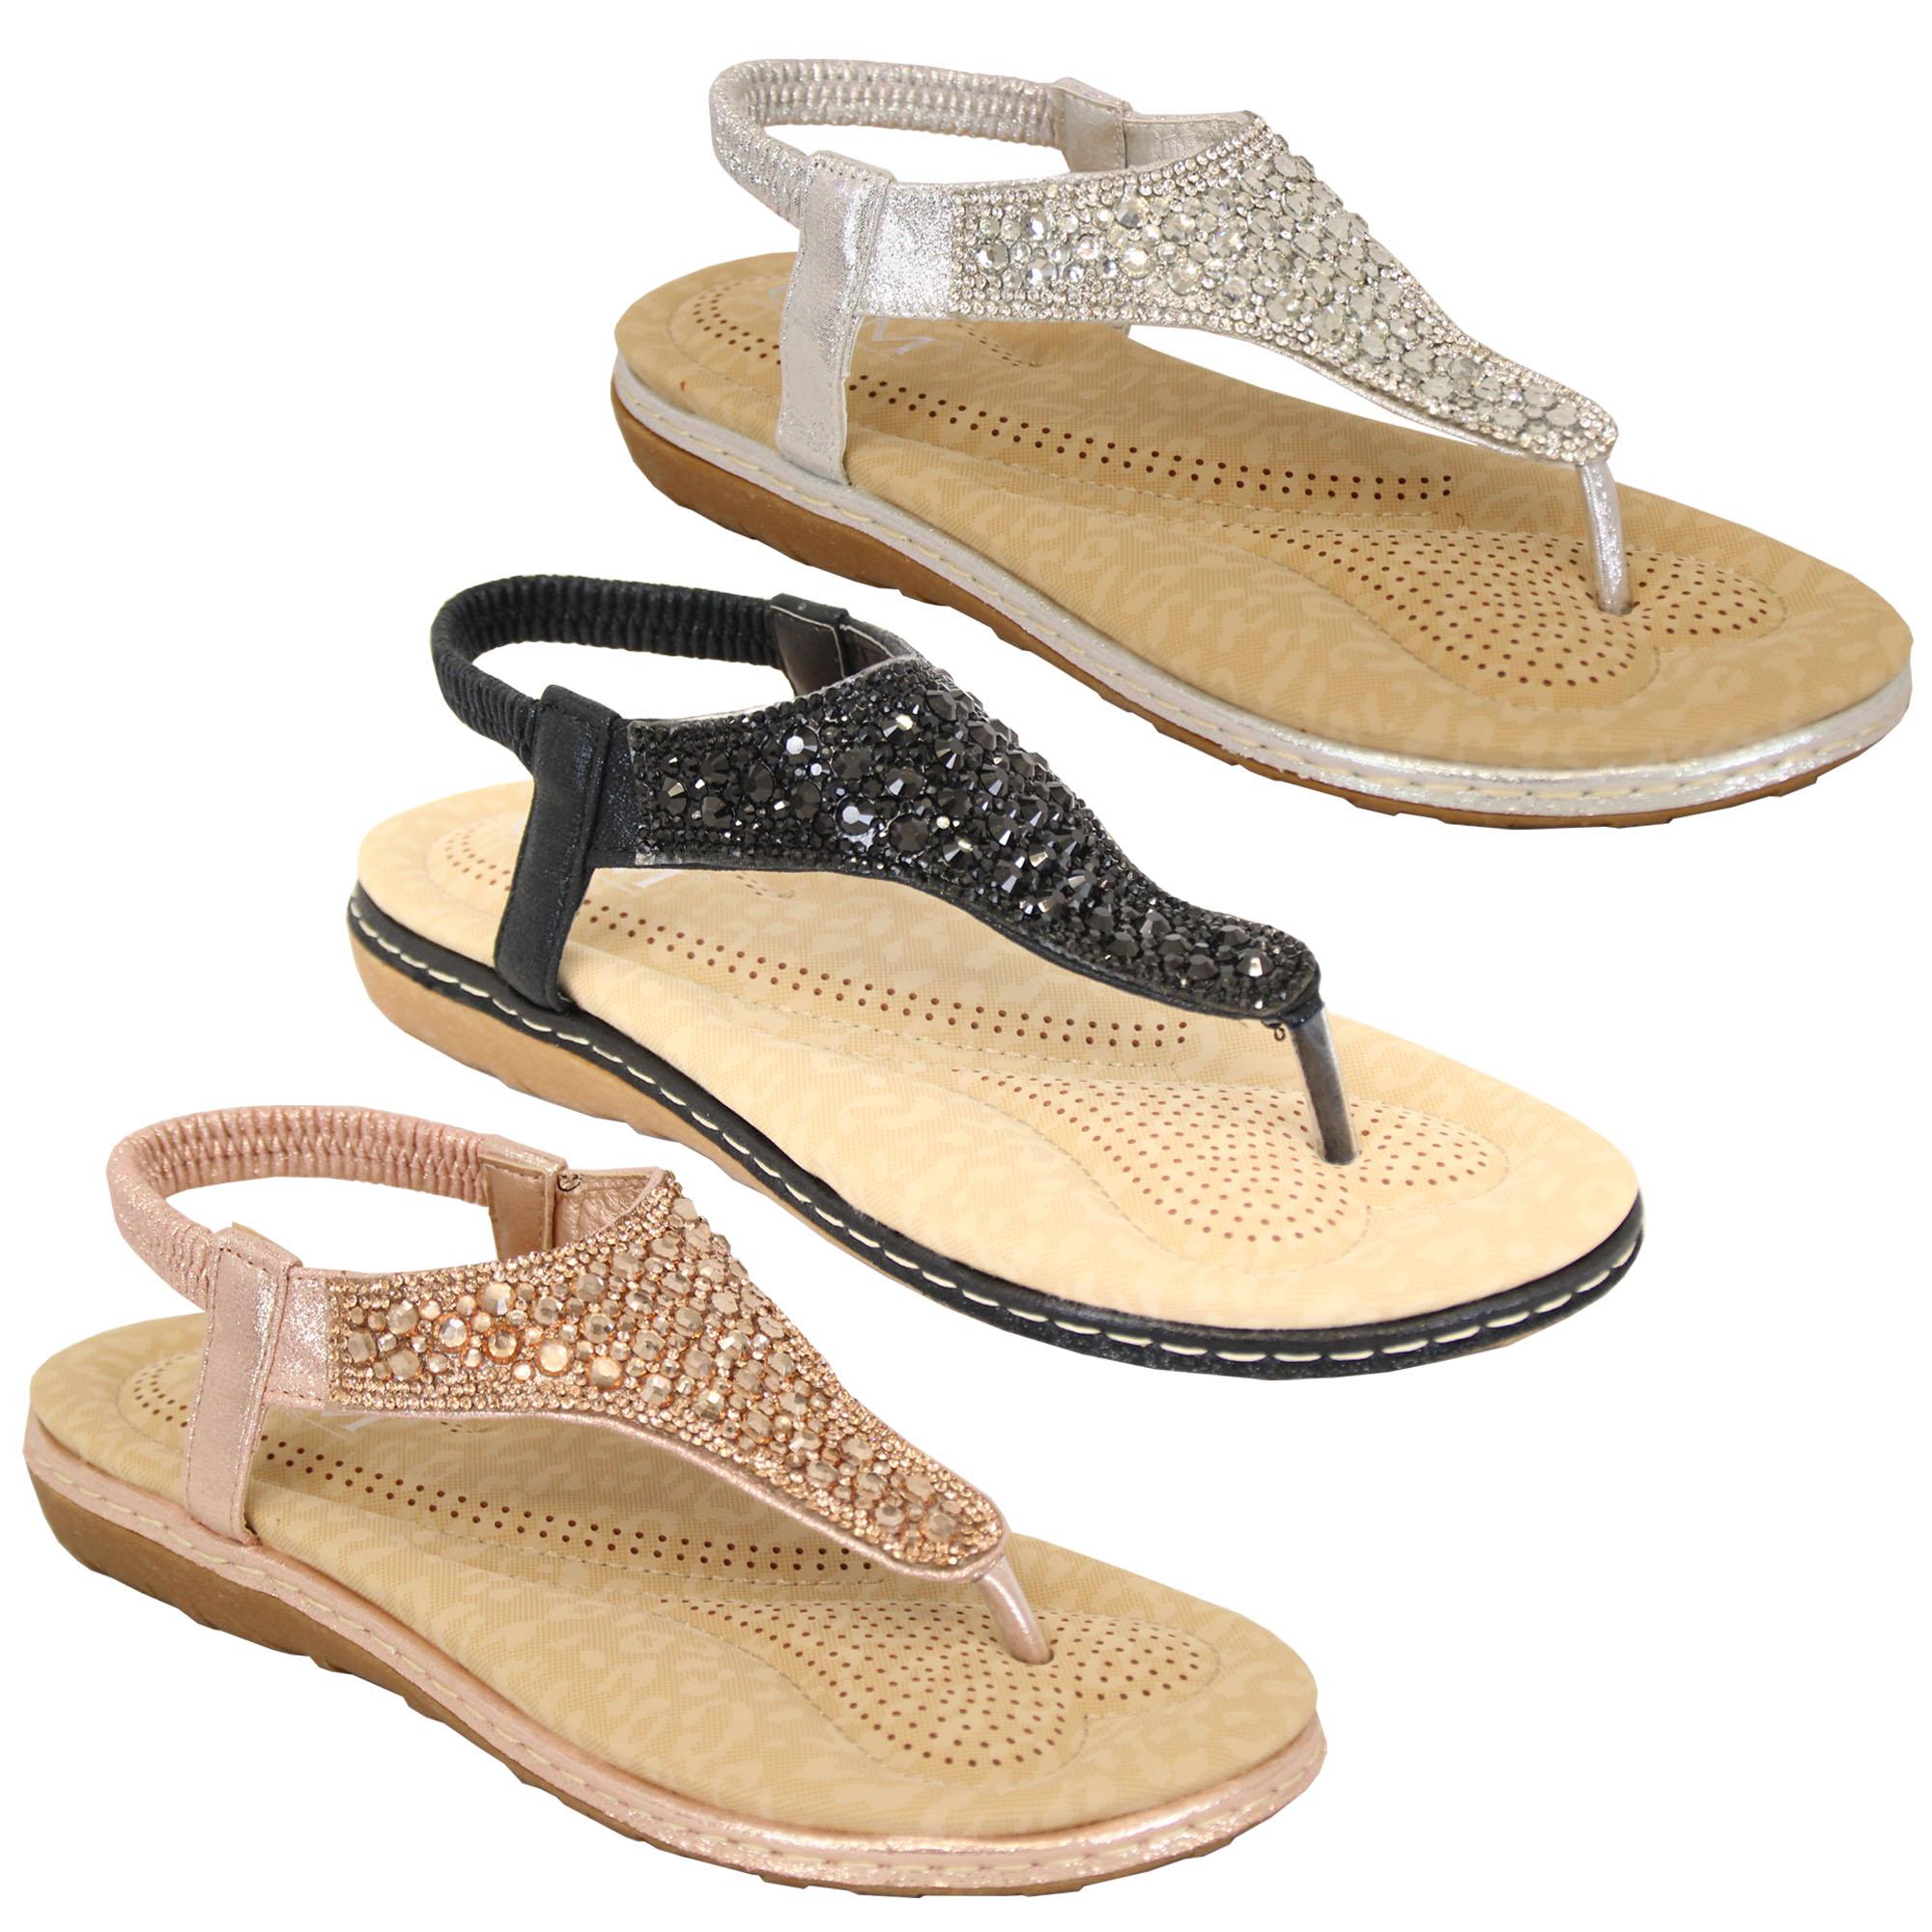 Ladies-Diamante-Sandals-Womens-Slip-On-Toe-Post-Sling-Back-Shoes-Wedding-Party thumbnail 5